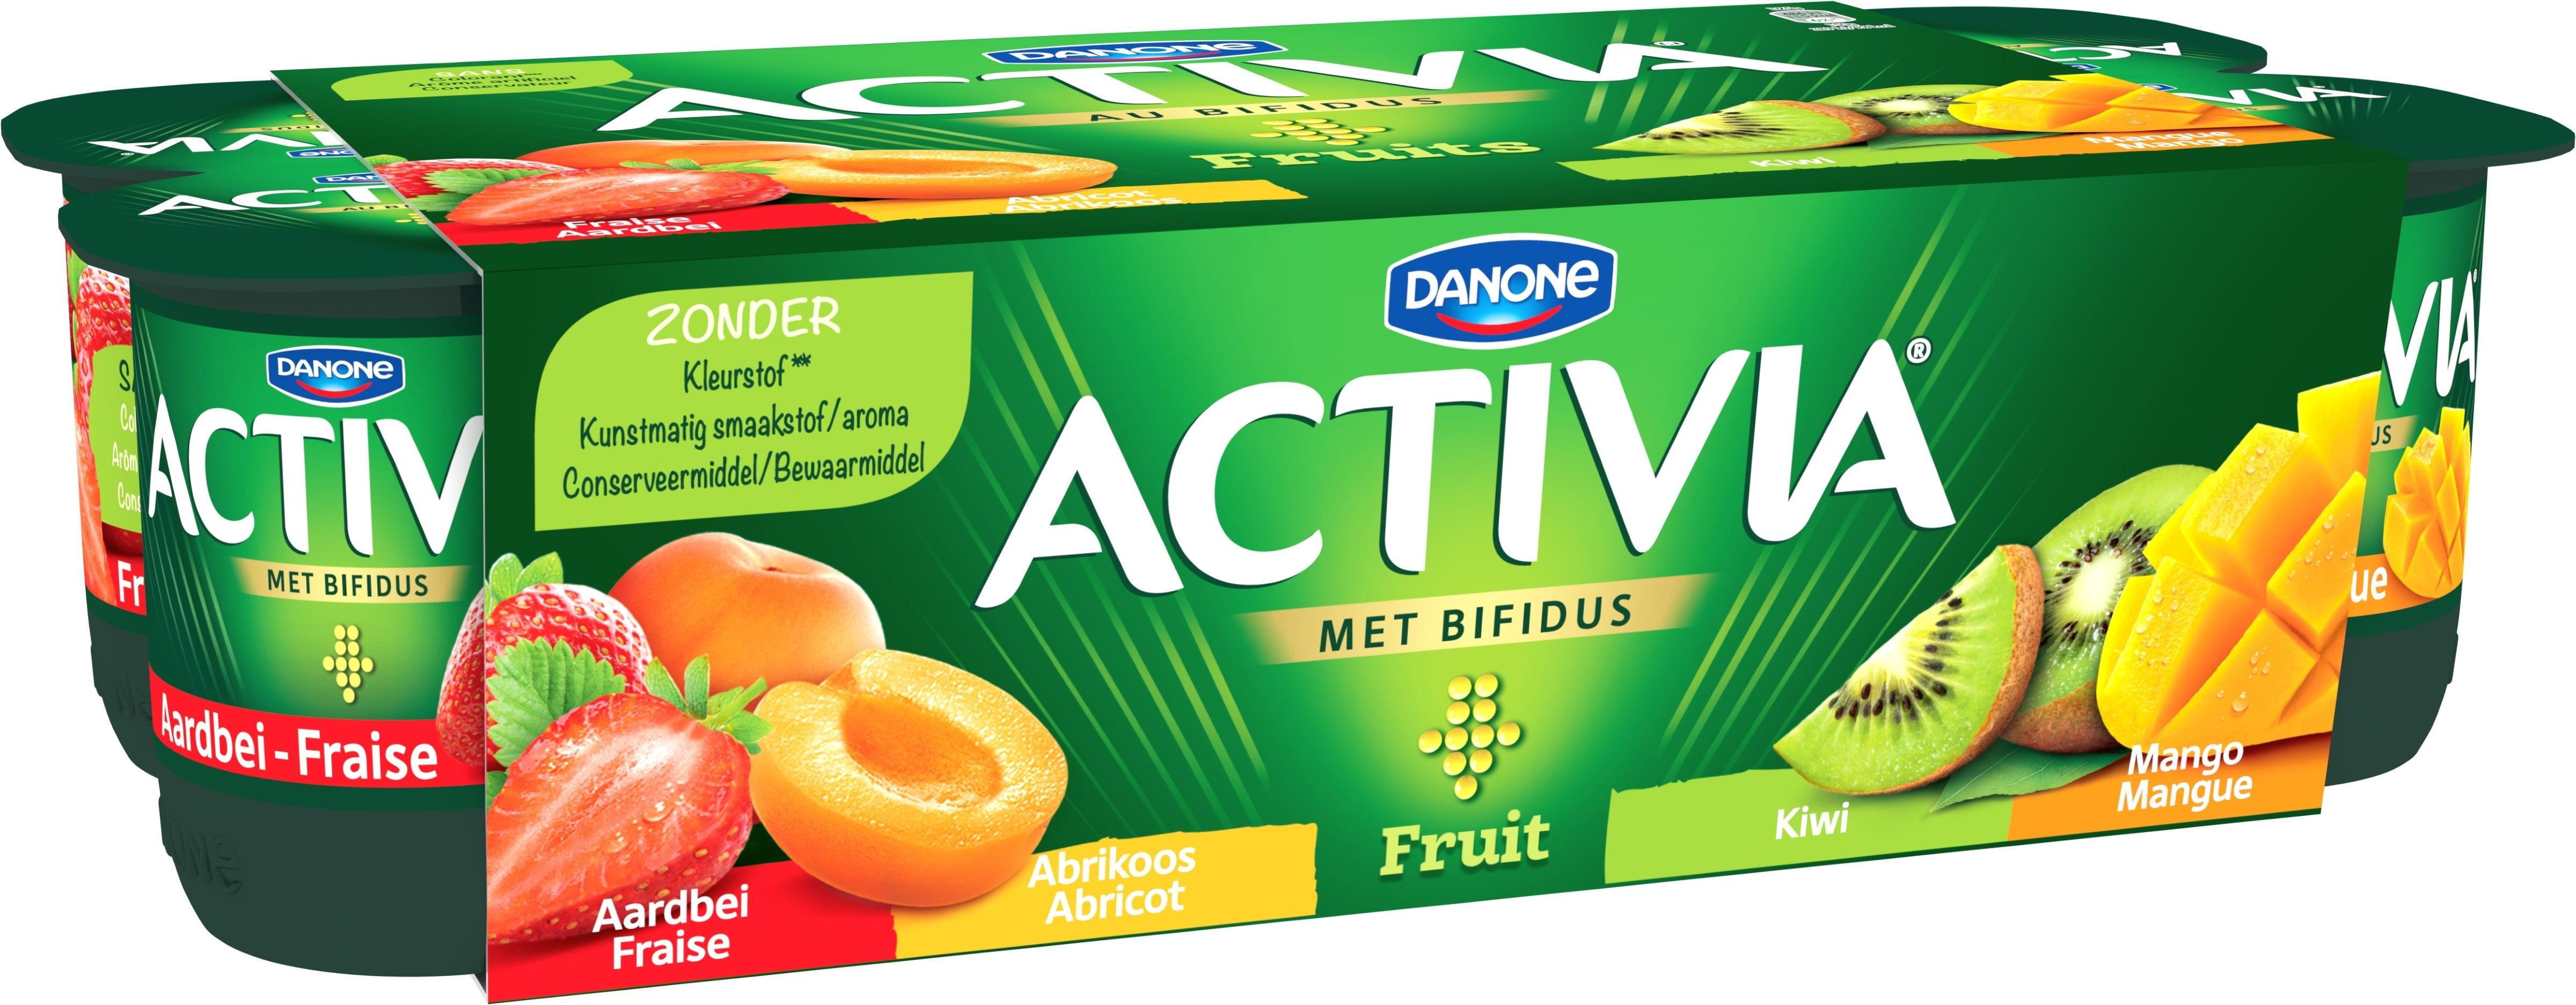 Activia Fruit - Fraise Abricot Kiwi Mangue